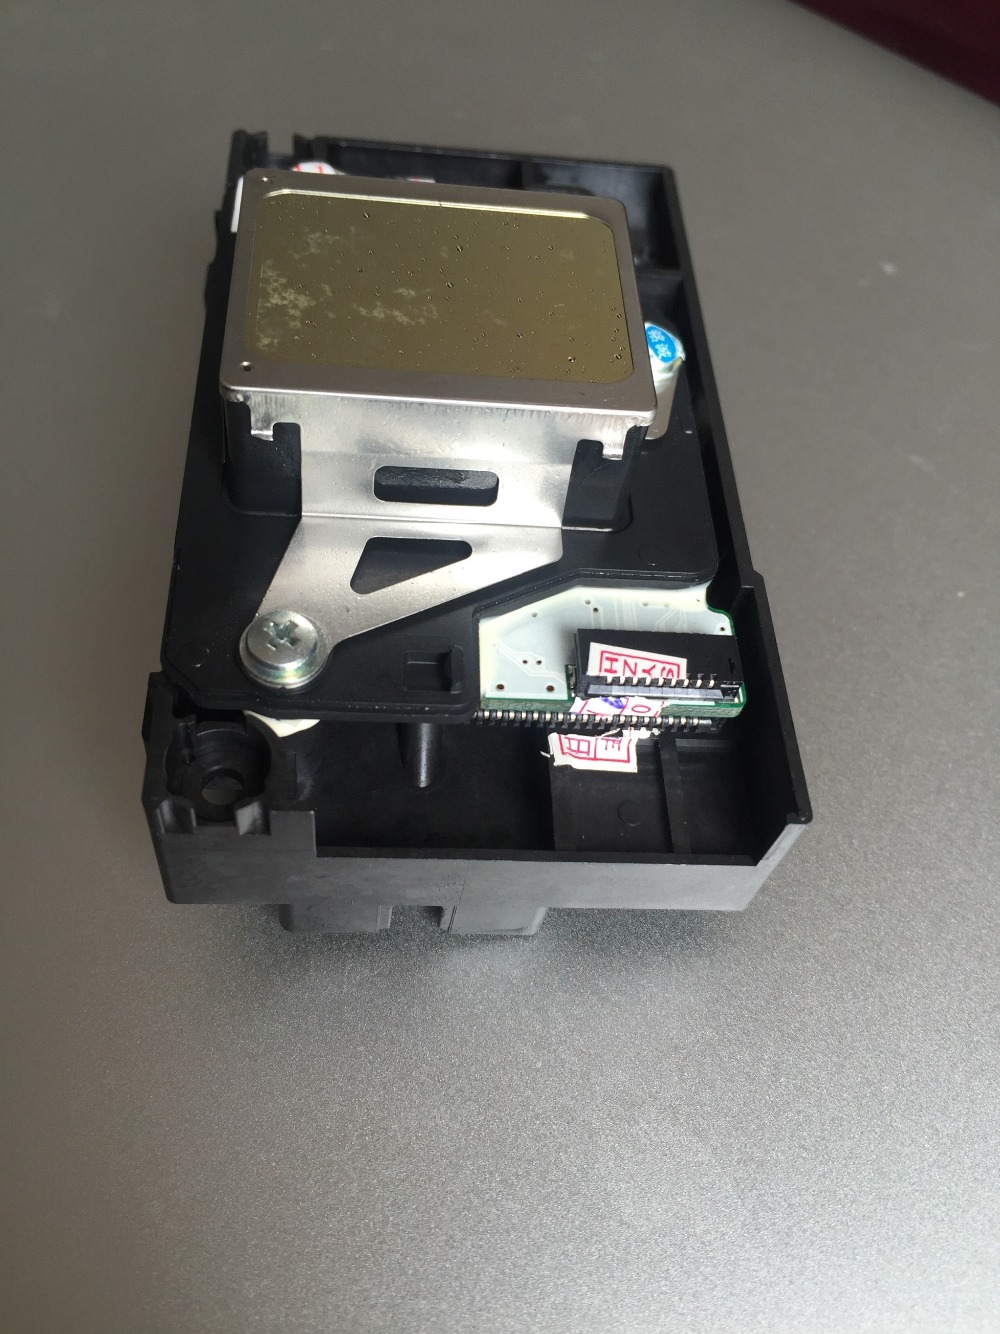 ORIGINAL F173050 F173030 Printhead Print Head for Epson 1400 1410 1430 R265 R260 1390 R270 R390 RX580 RX590 R360 R380